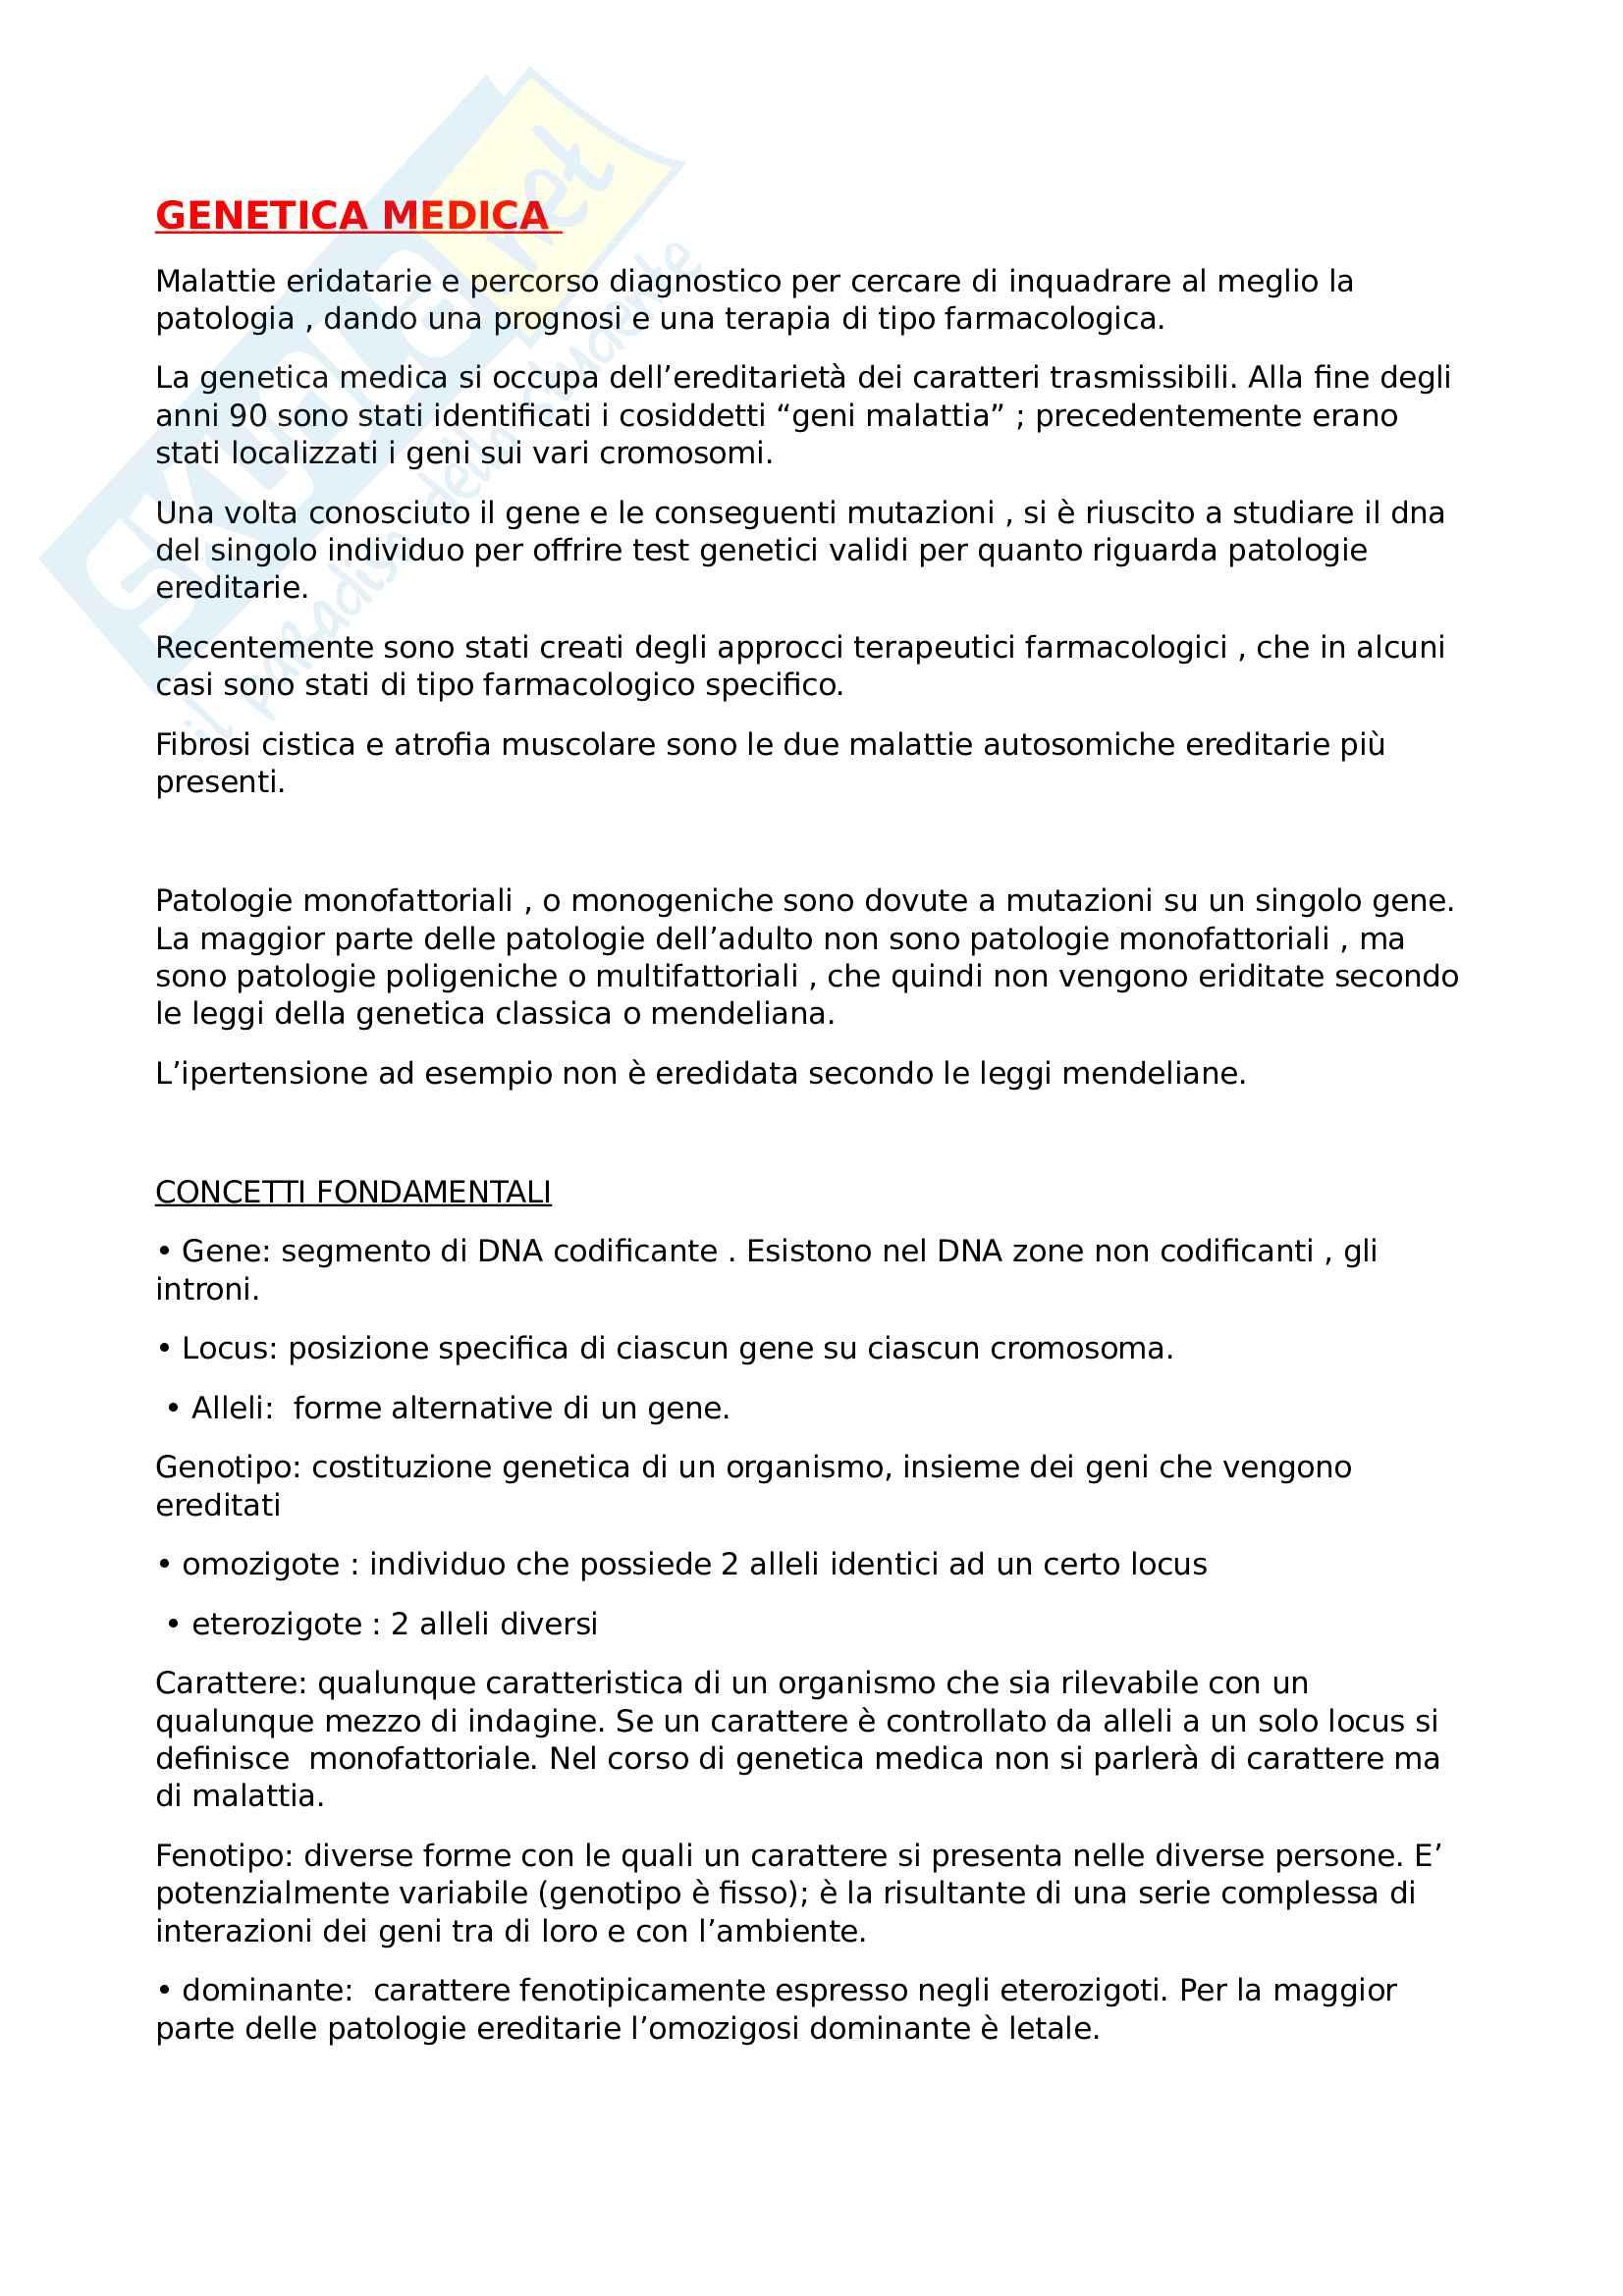 Genetica medica: introduzione e malattie autosomiche dominanti